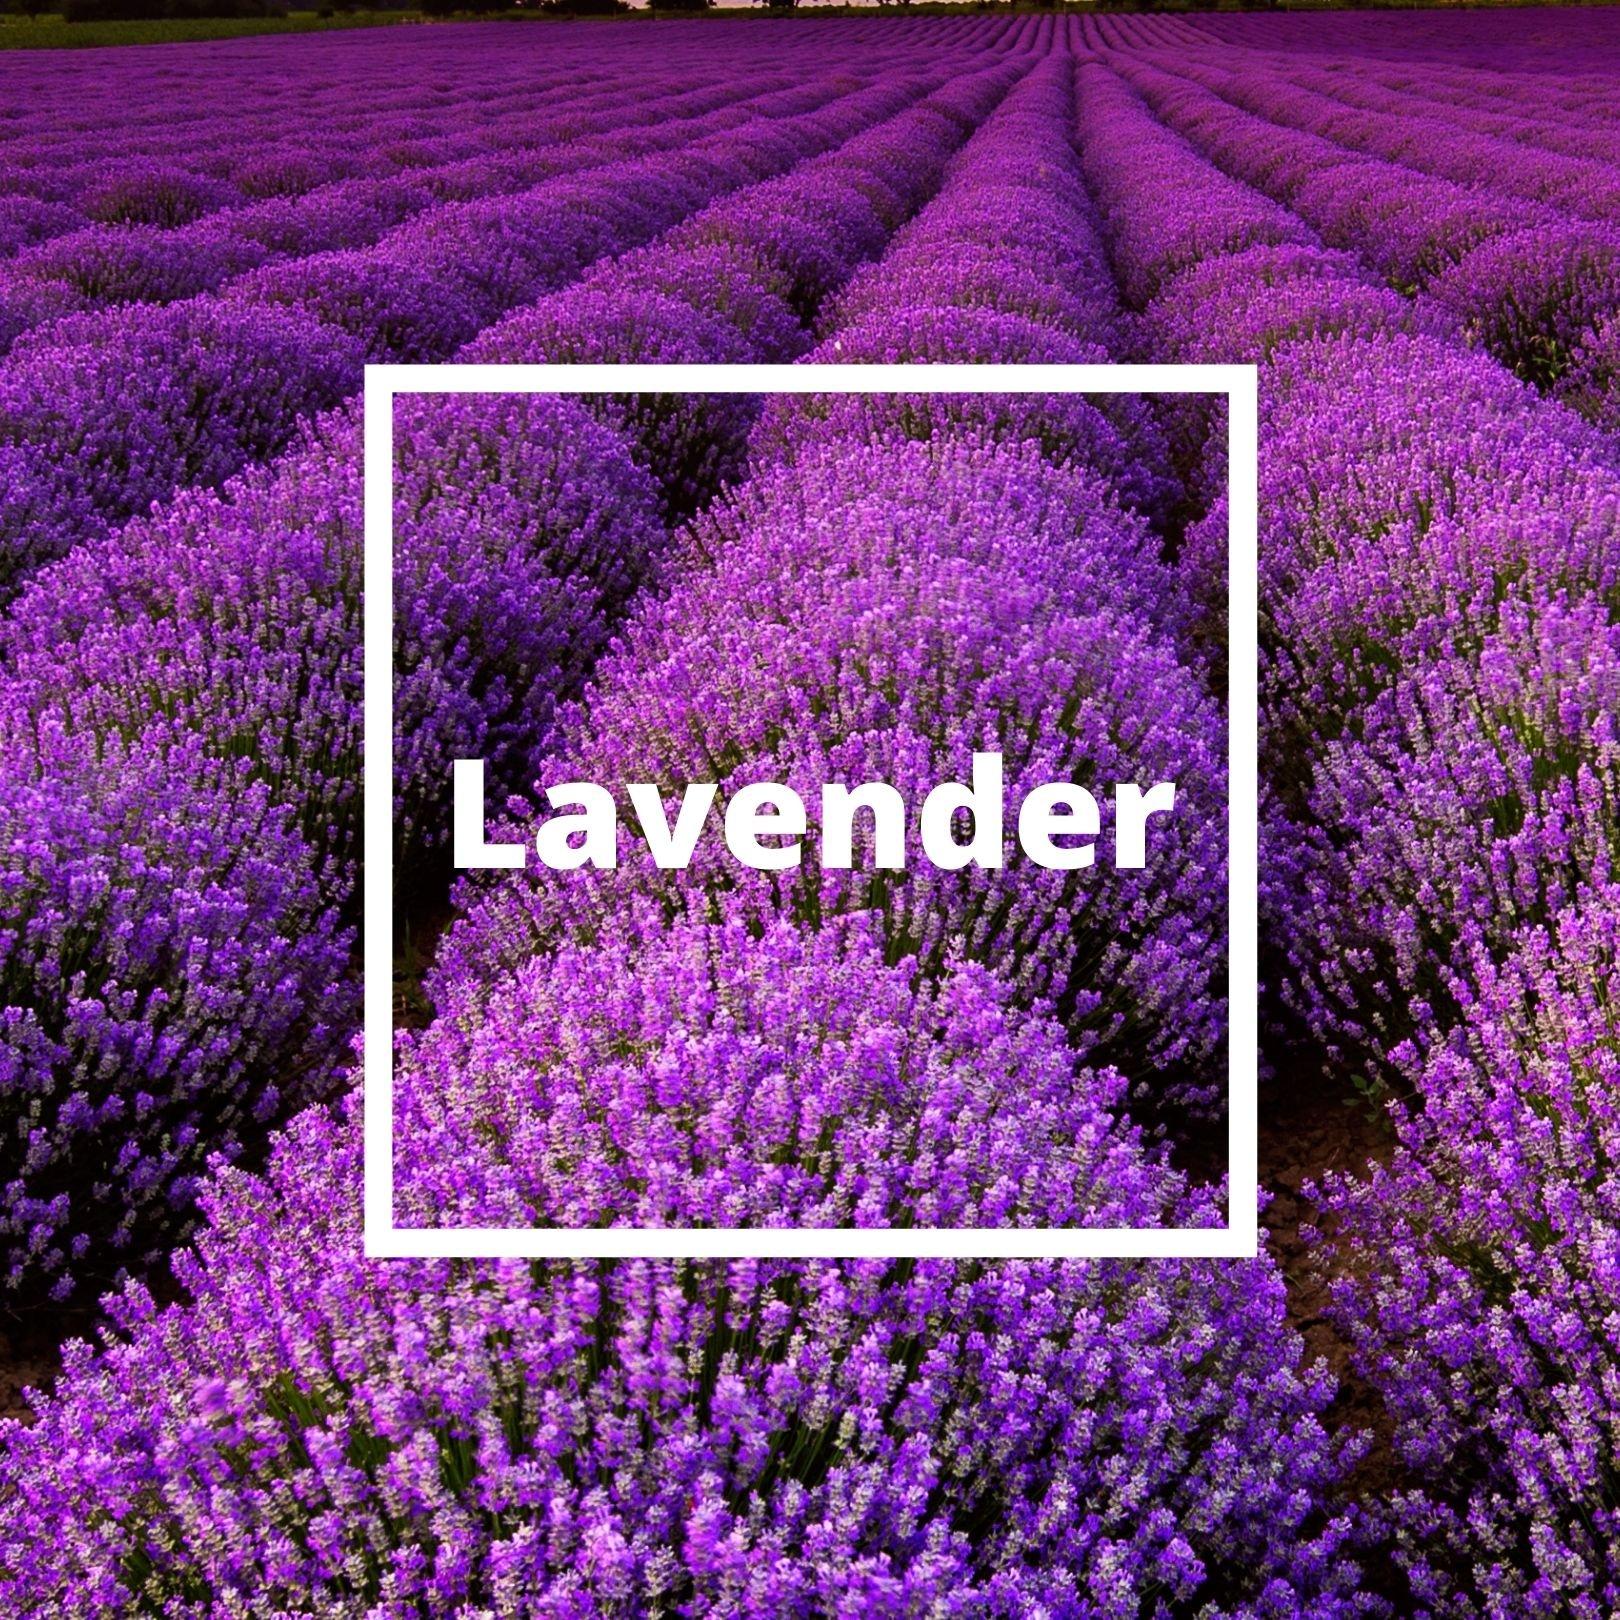 L'ATELIERO - Lavender - Irresistible Man